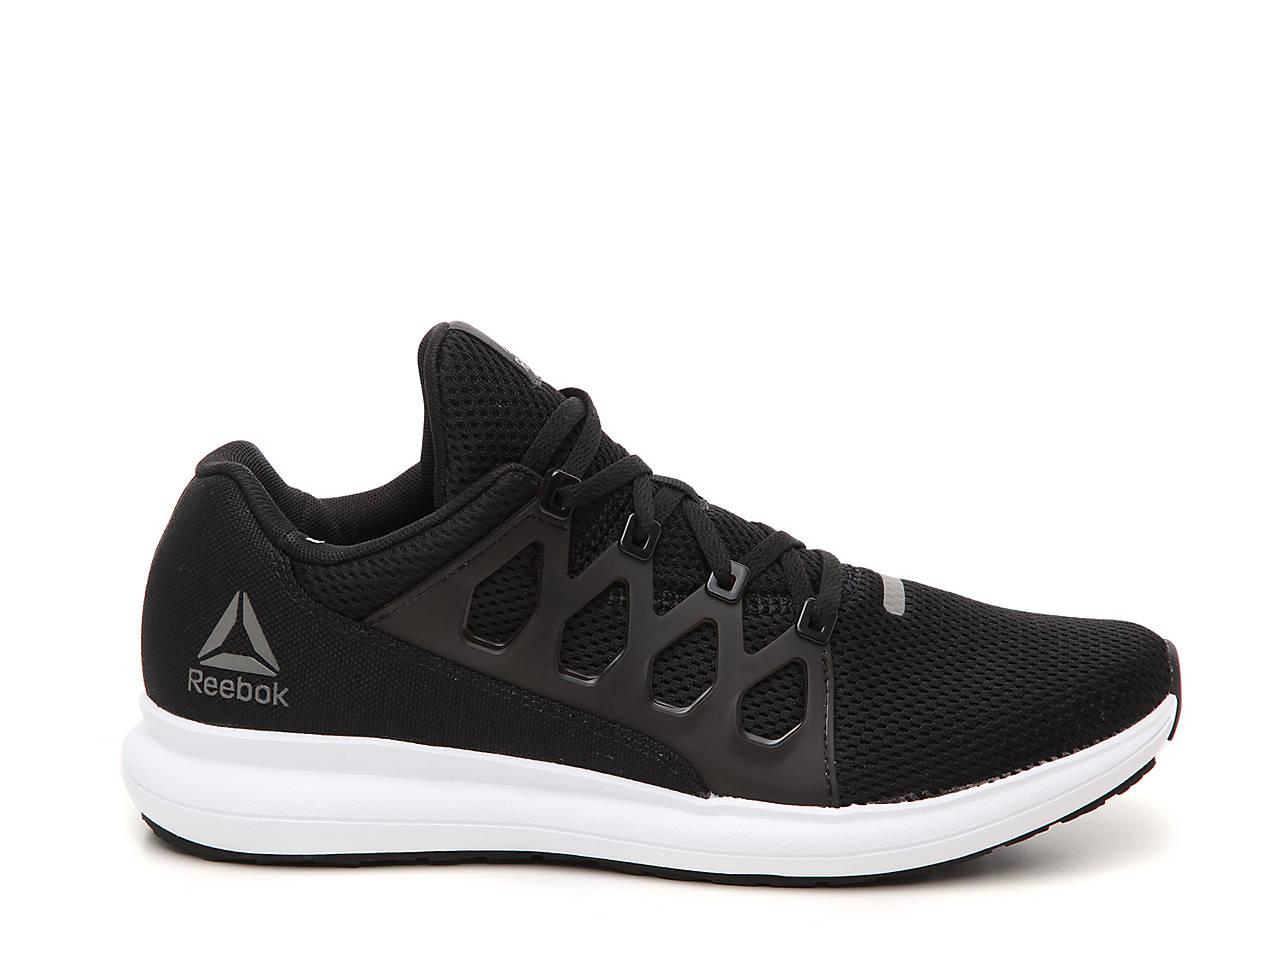 Reebok Driftium Ride 2.0 Running Shoe Men's Men's Shoes DSW  DSW